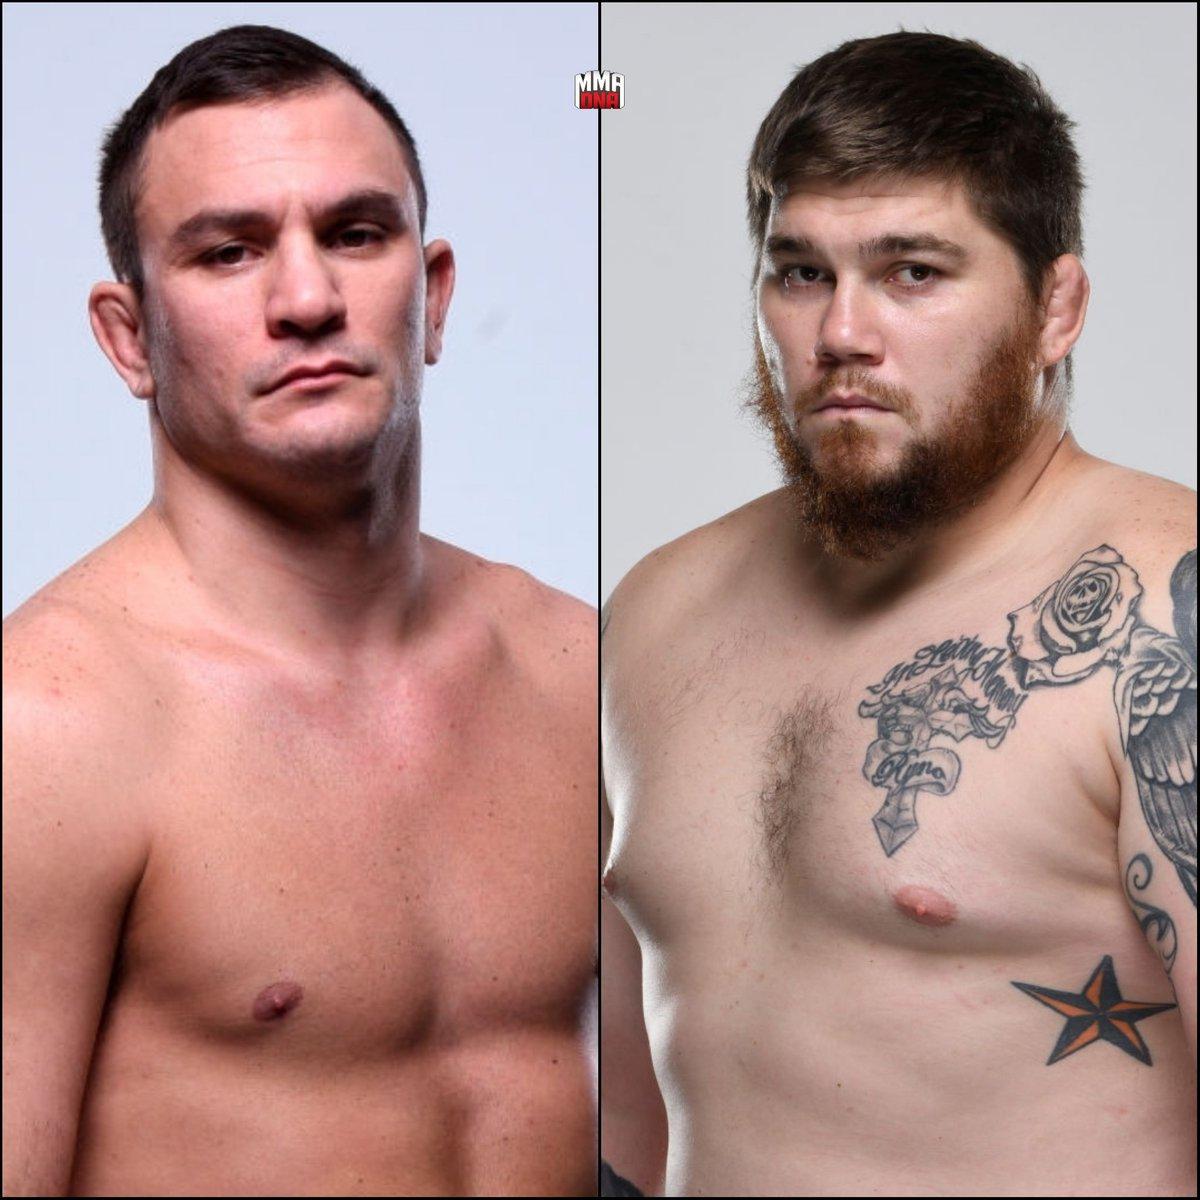 Gian Villante will fight Jake Collier at UFC event on December 5th. (per @MMAjunkie) #UFC #MMA #UFCESPN https://t.co/6xmq145xO7